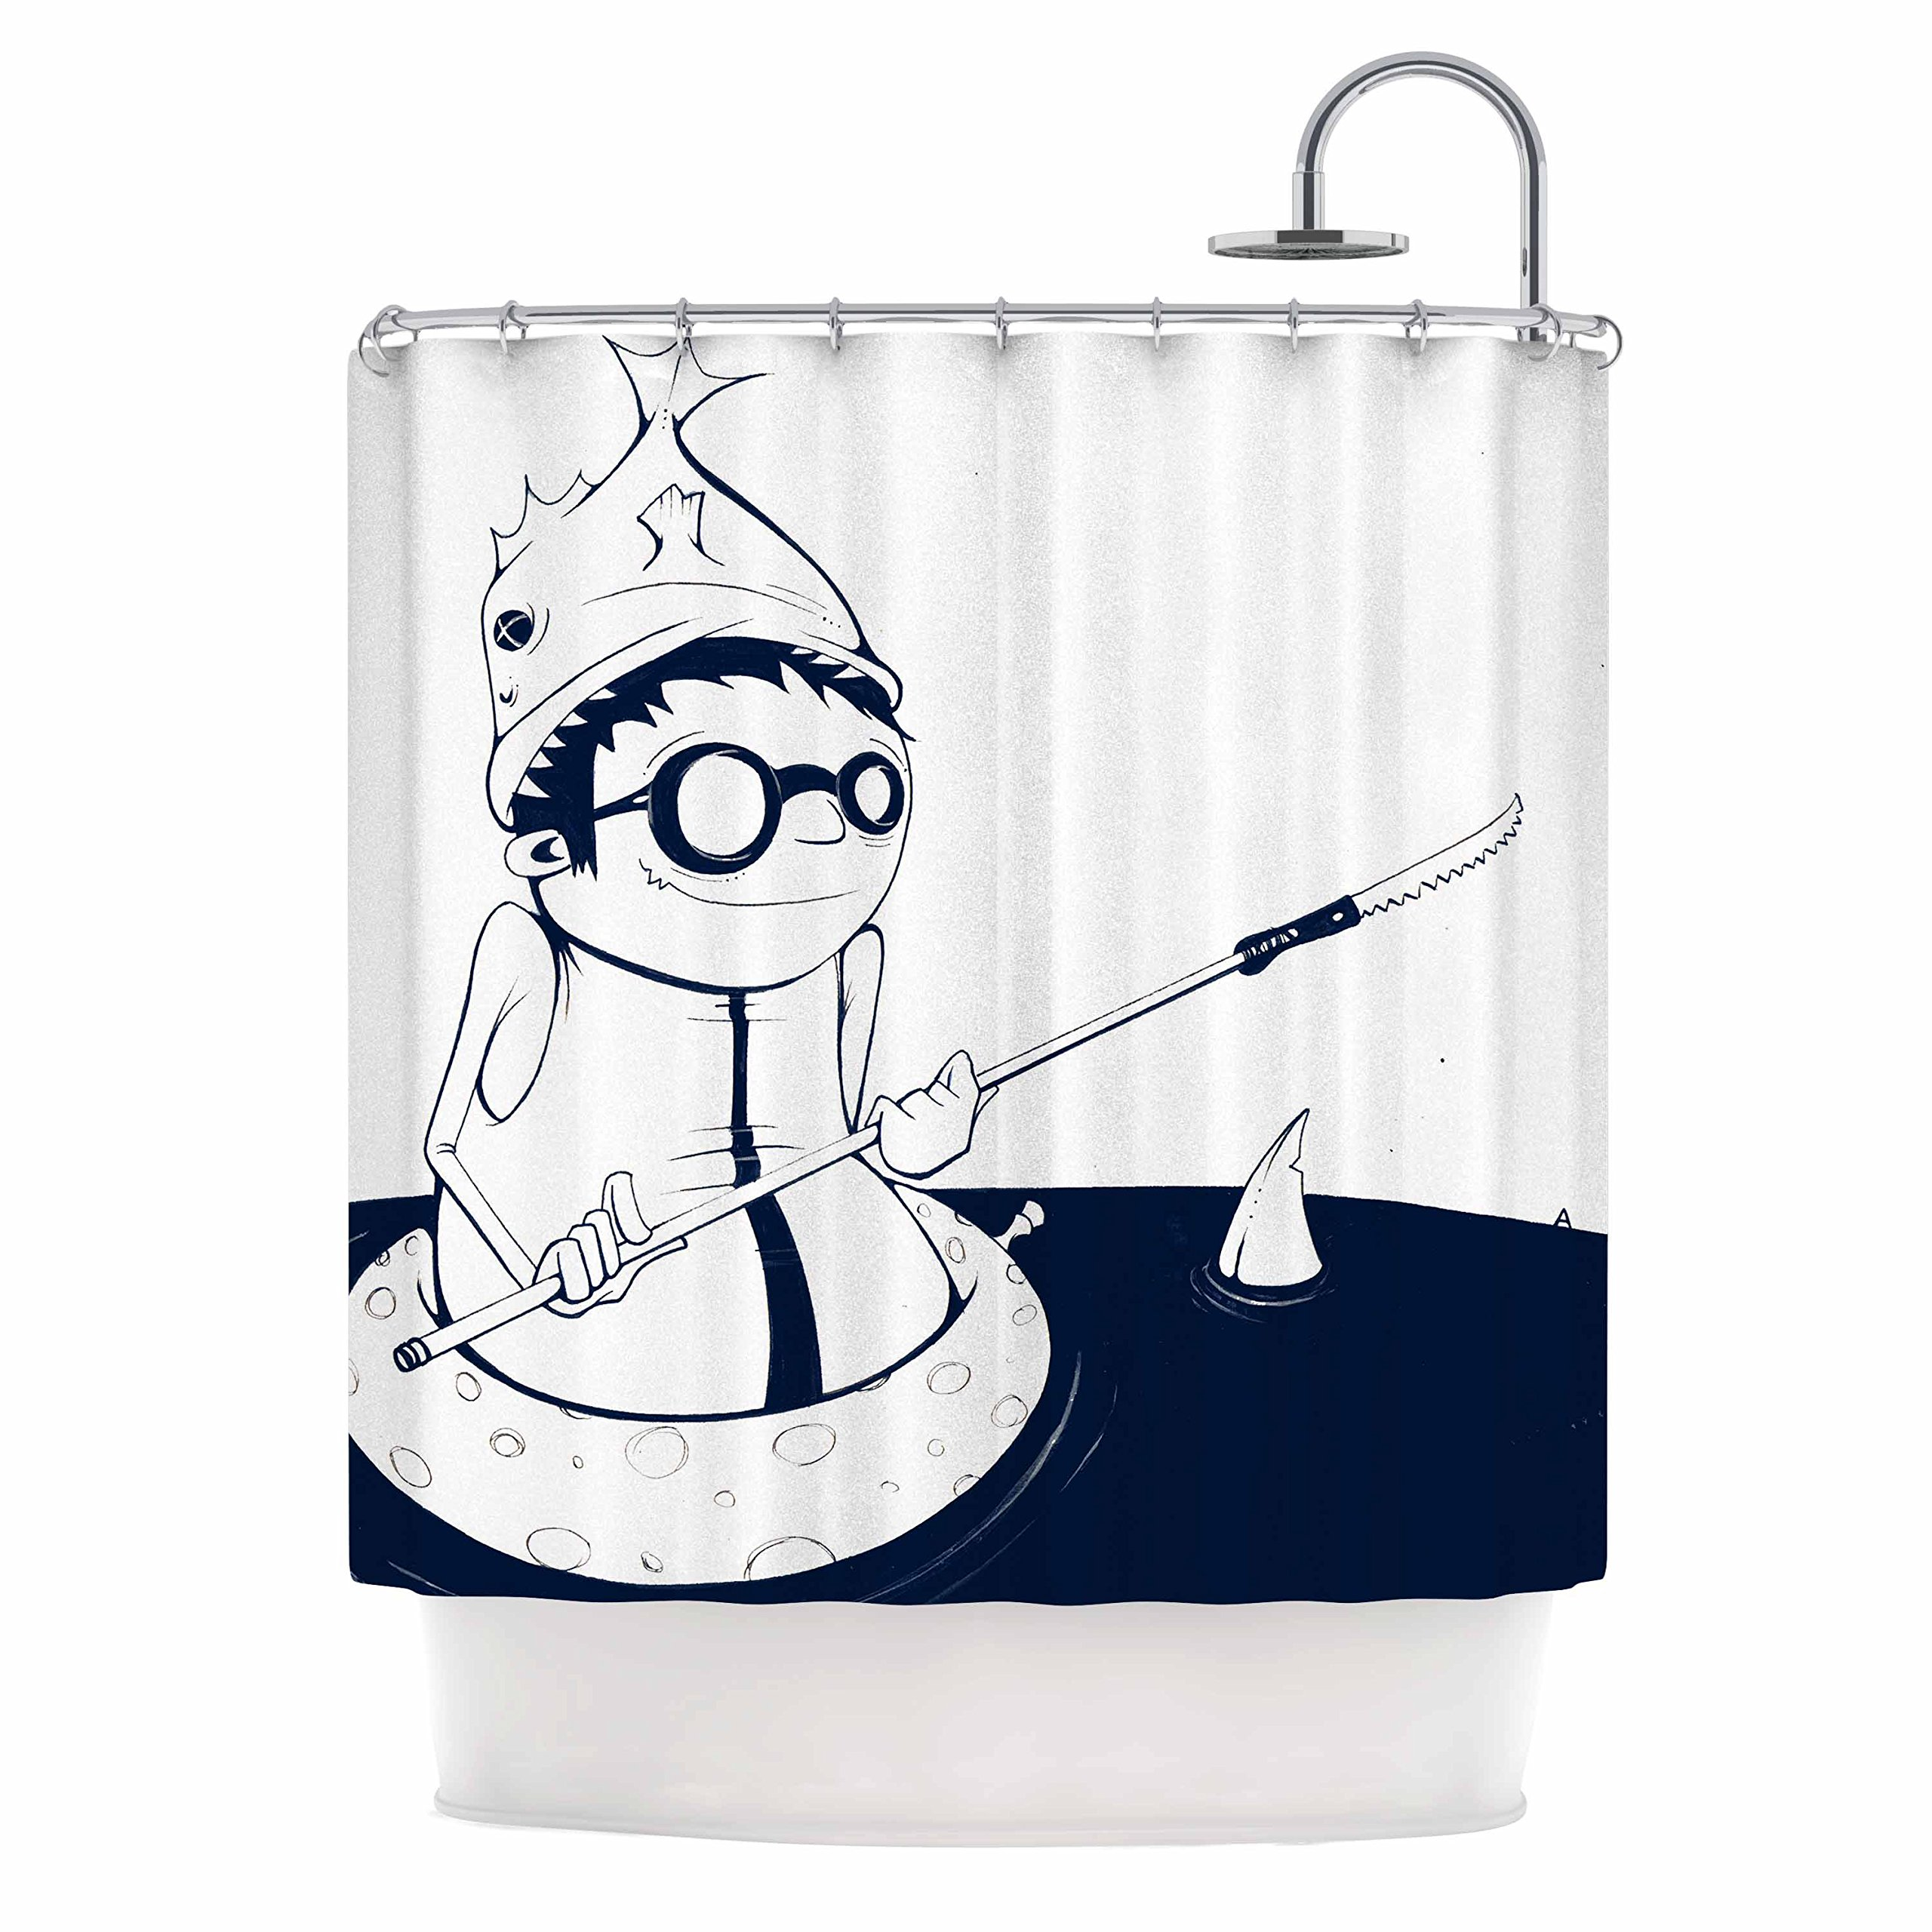 Kess InHouse Matthew Reid 5 in Navy Blue Nautical llustration, 69'' x 70'' Shower Curtain